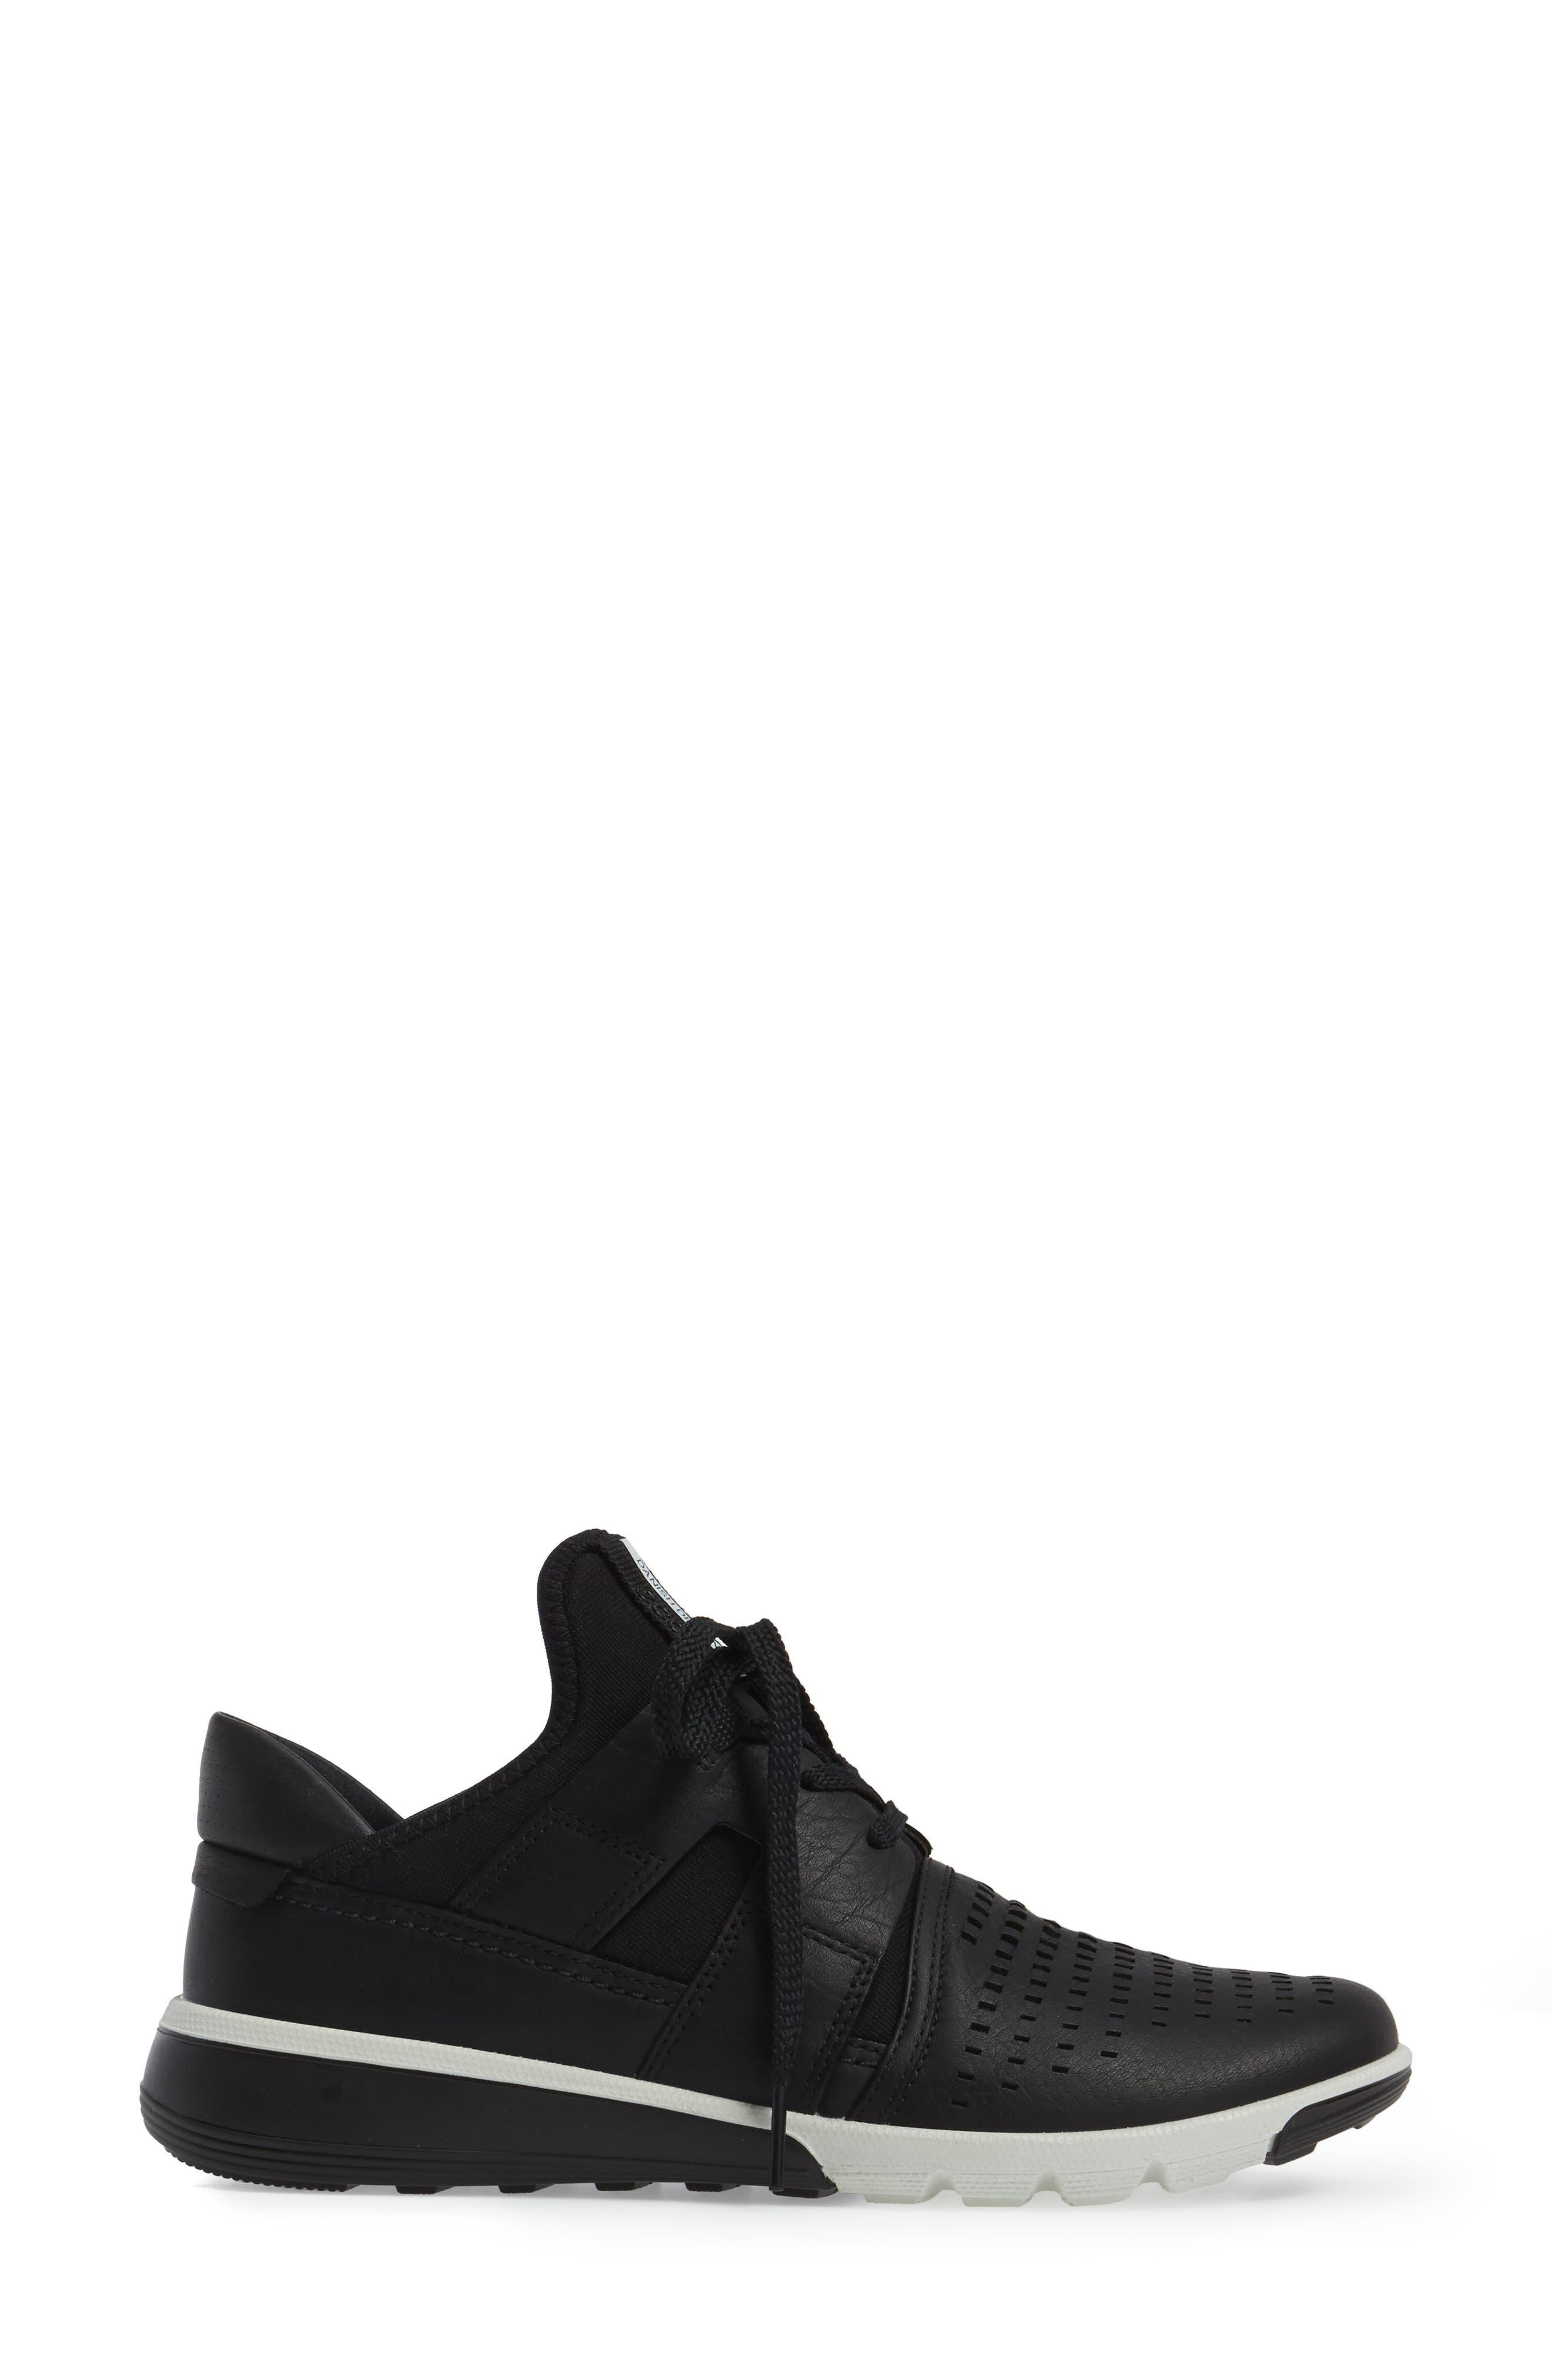 Alternate Image 3  - ECCO Intrinsic 2 Sneaker (Women)